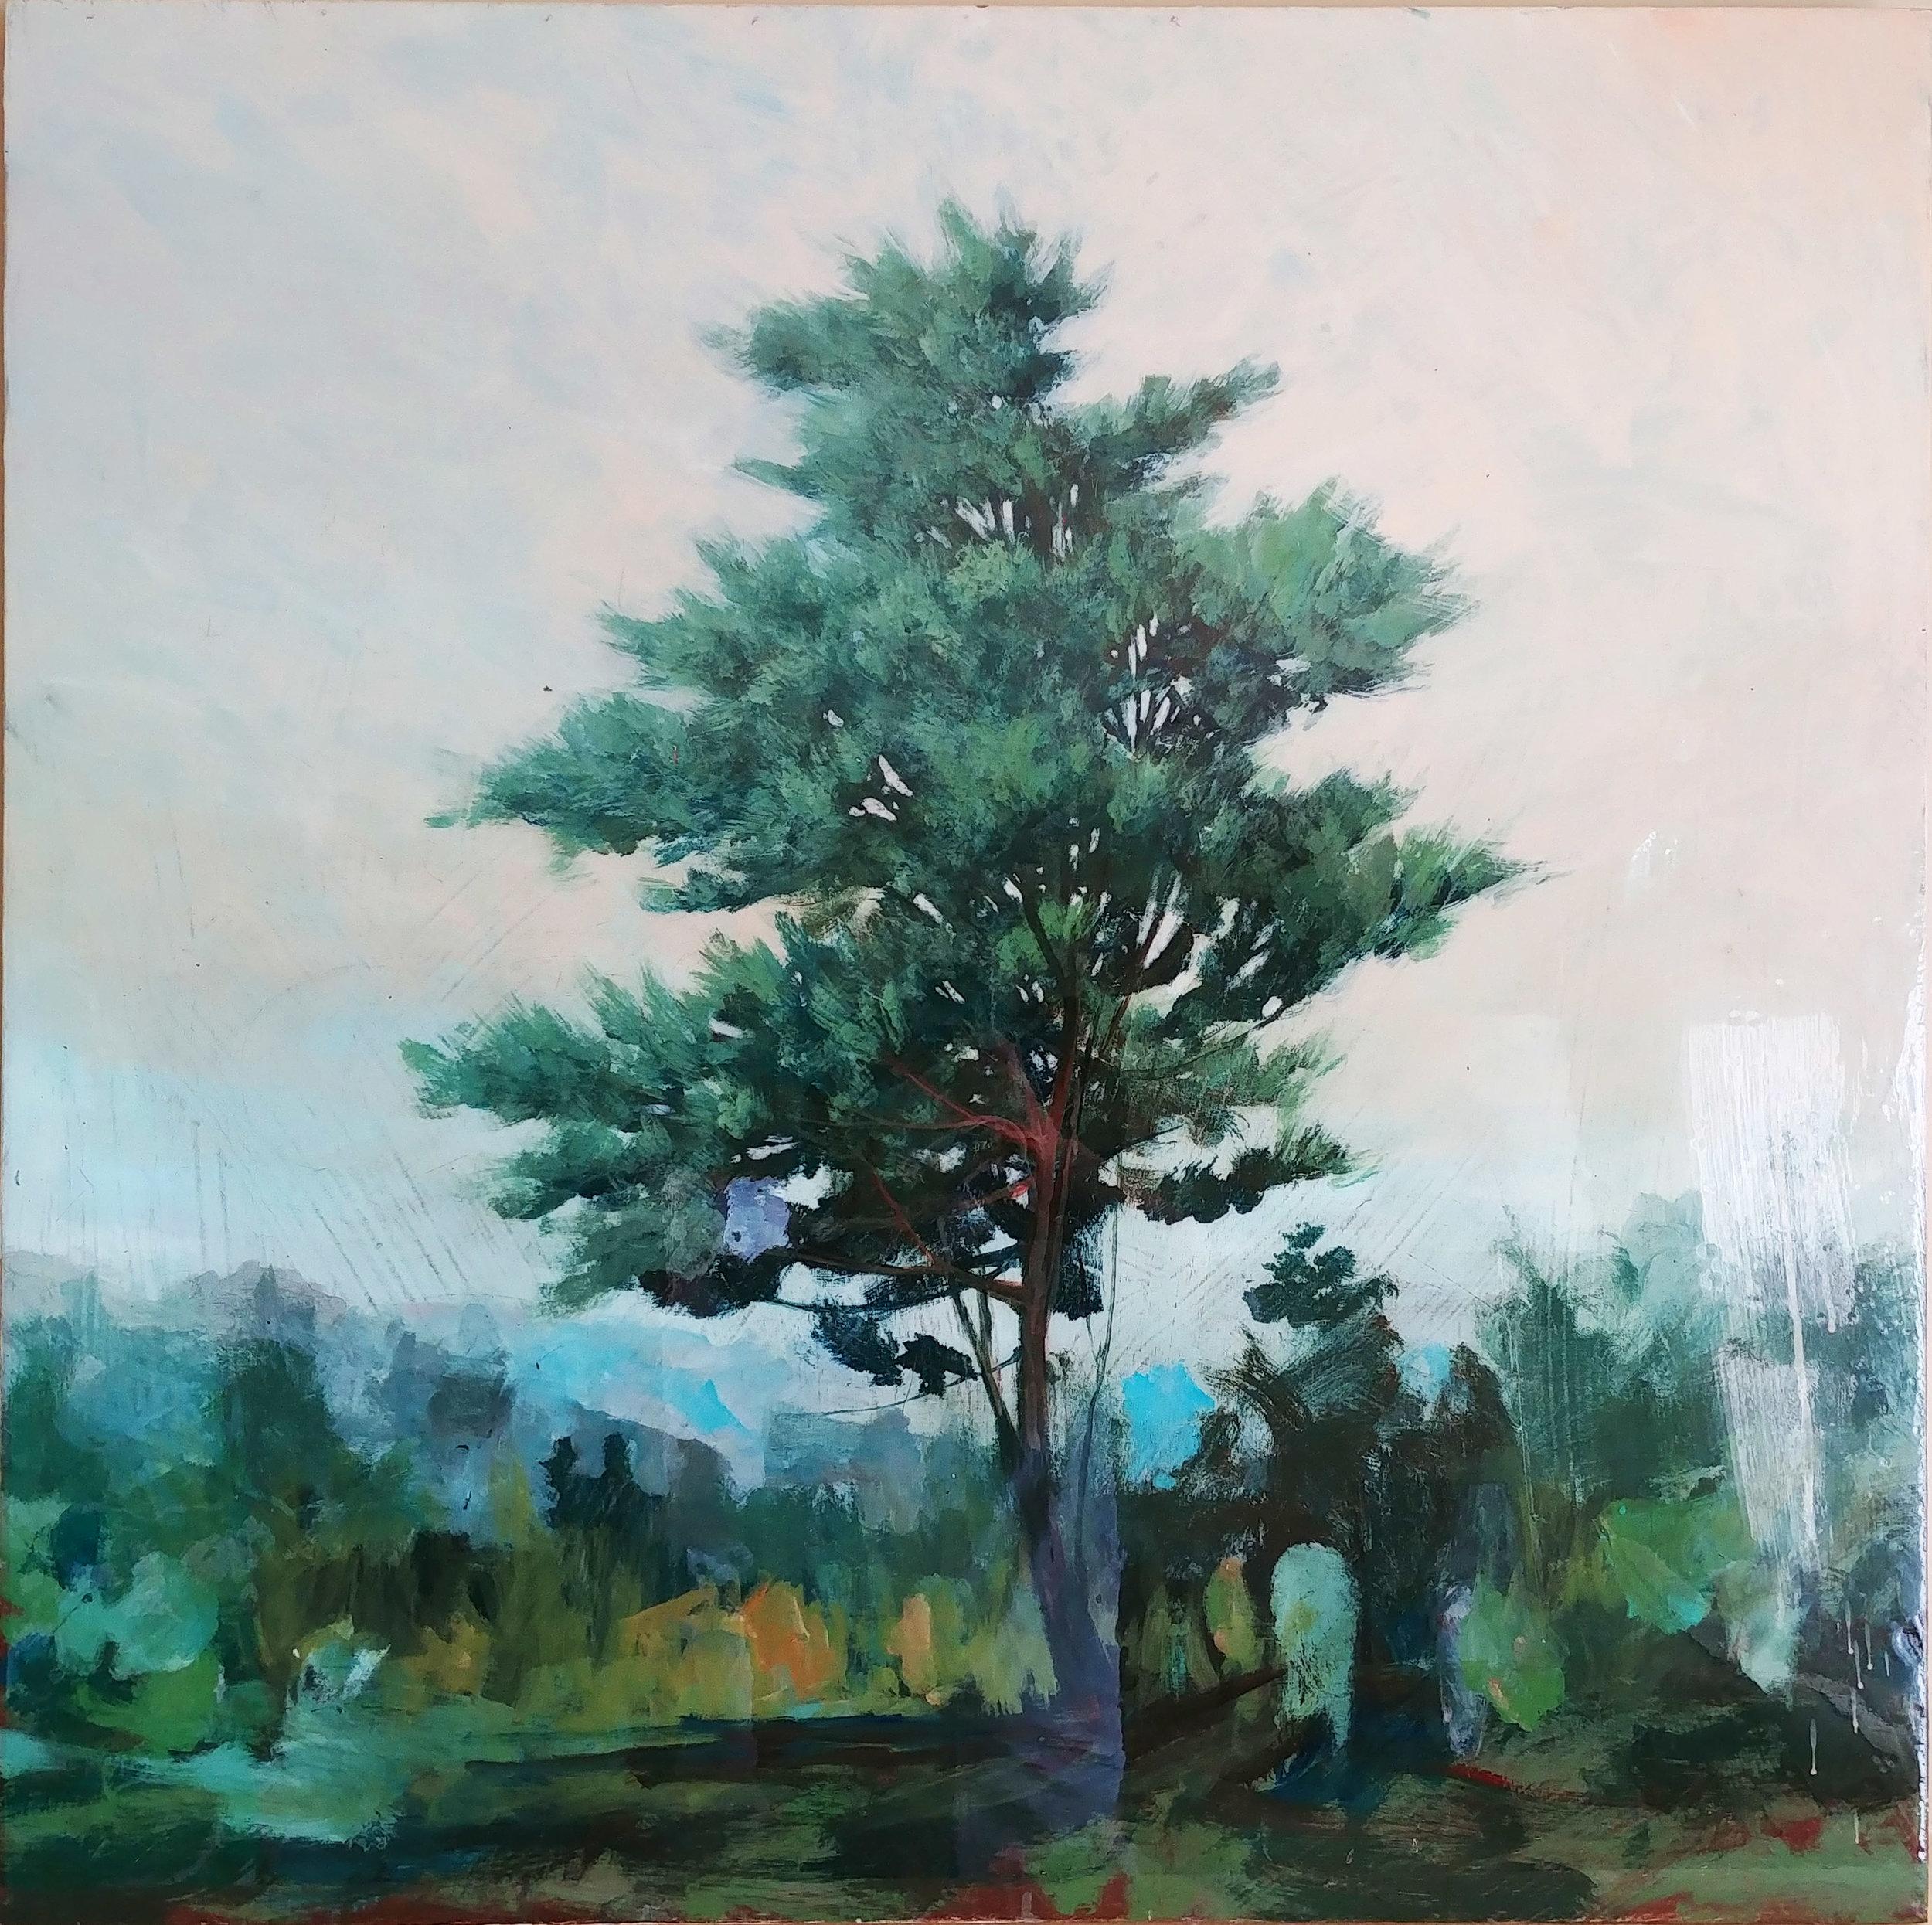 Pine 2, 2018